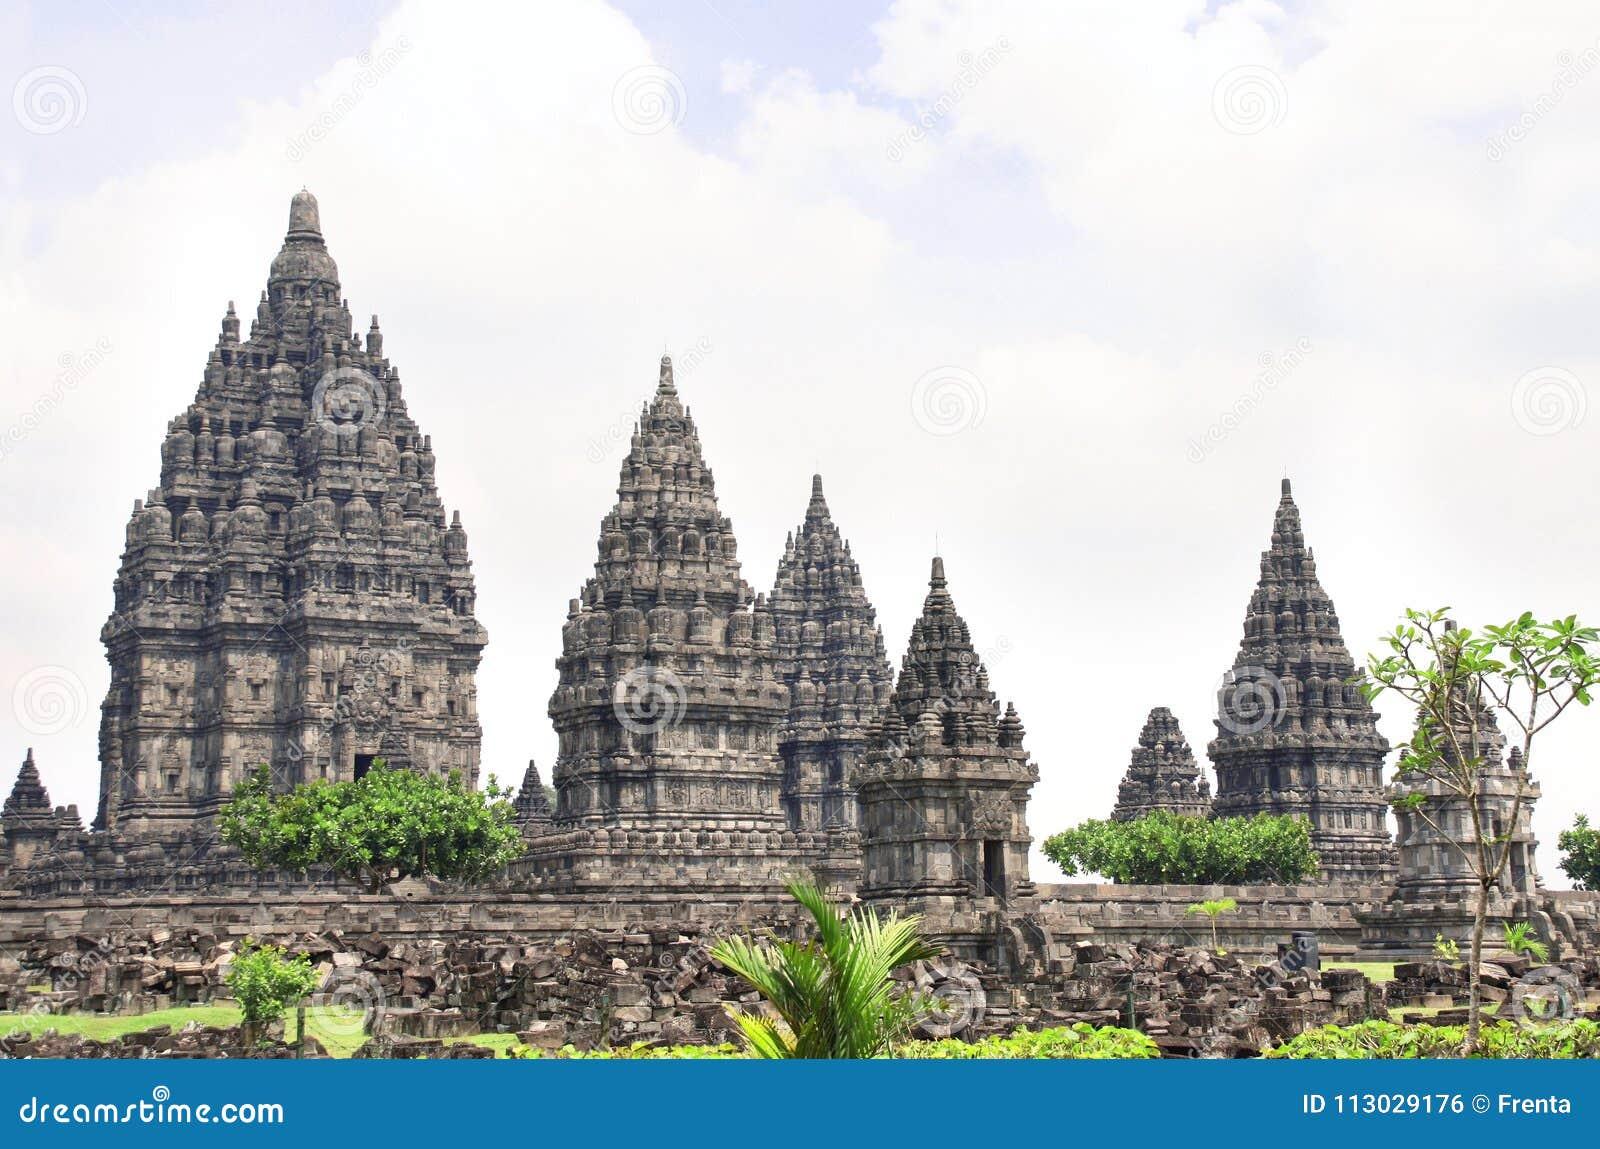 Capilla del templo hindú de Prambanan, Yogyakarta, Java, Indonesia